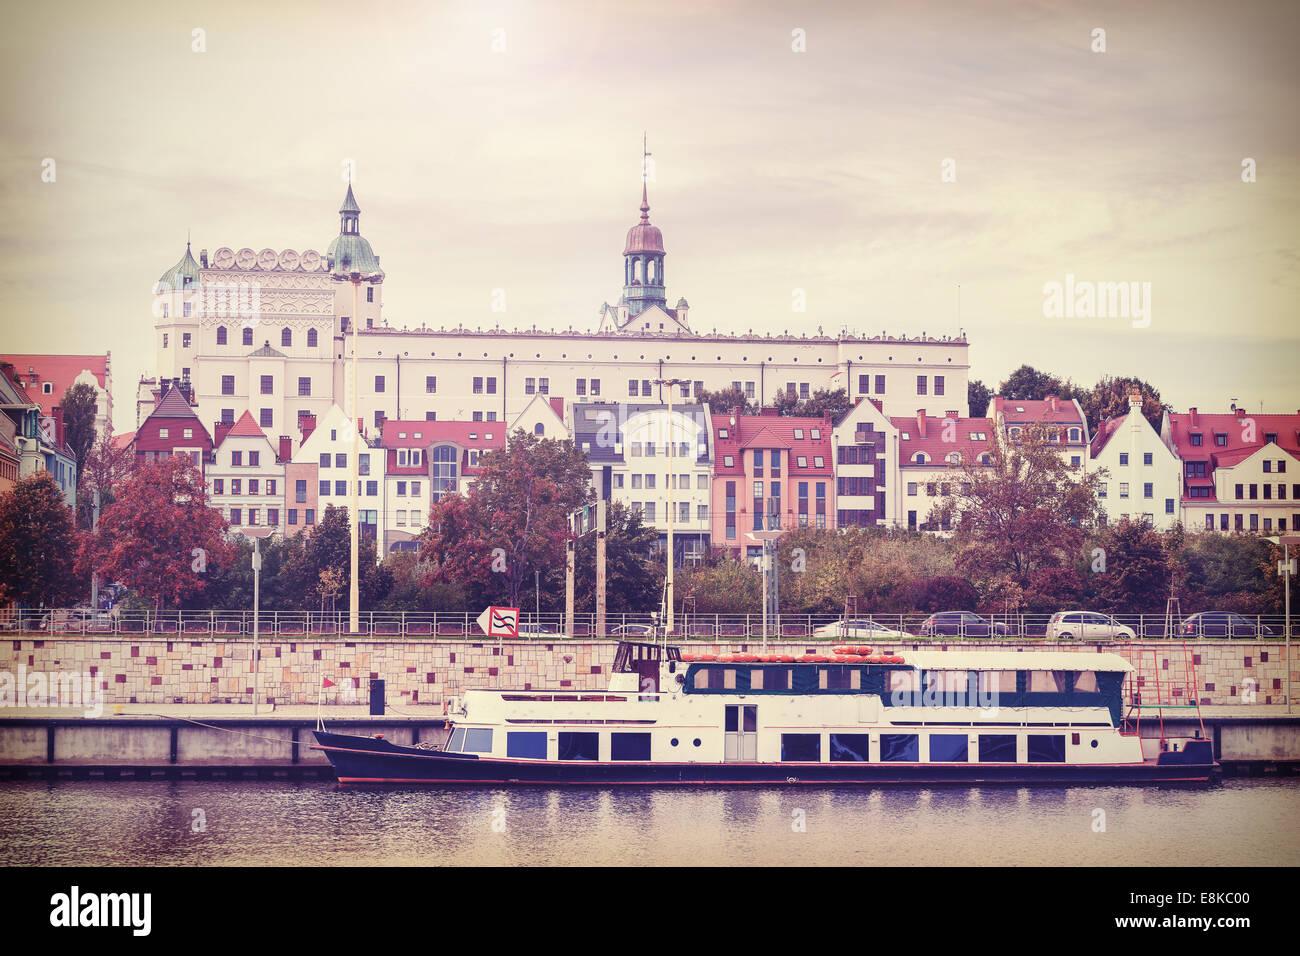 Vintage Retro foto filtrada de Szczecin riverside vista, Polonia Imagen De Stock